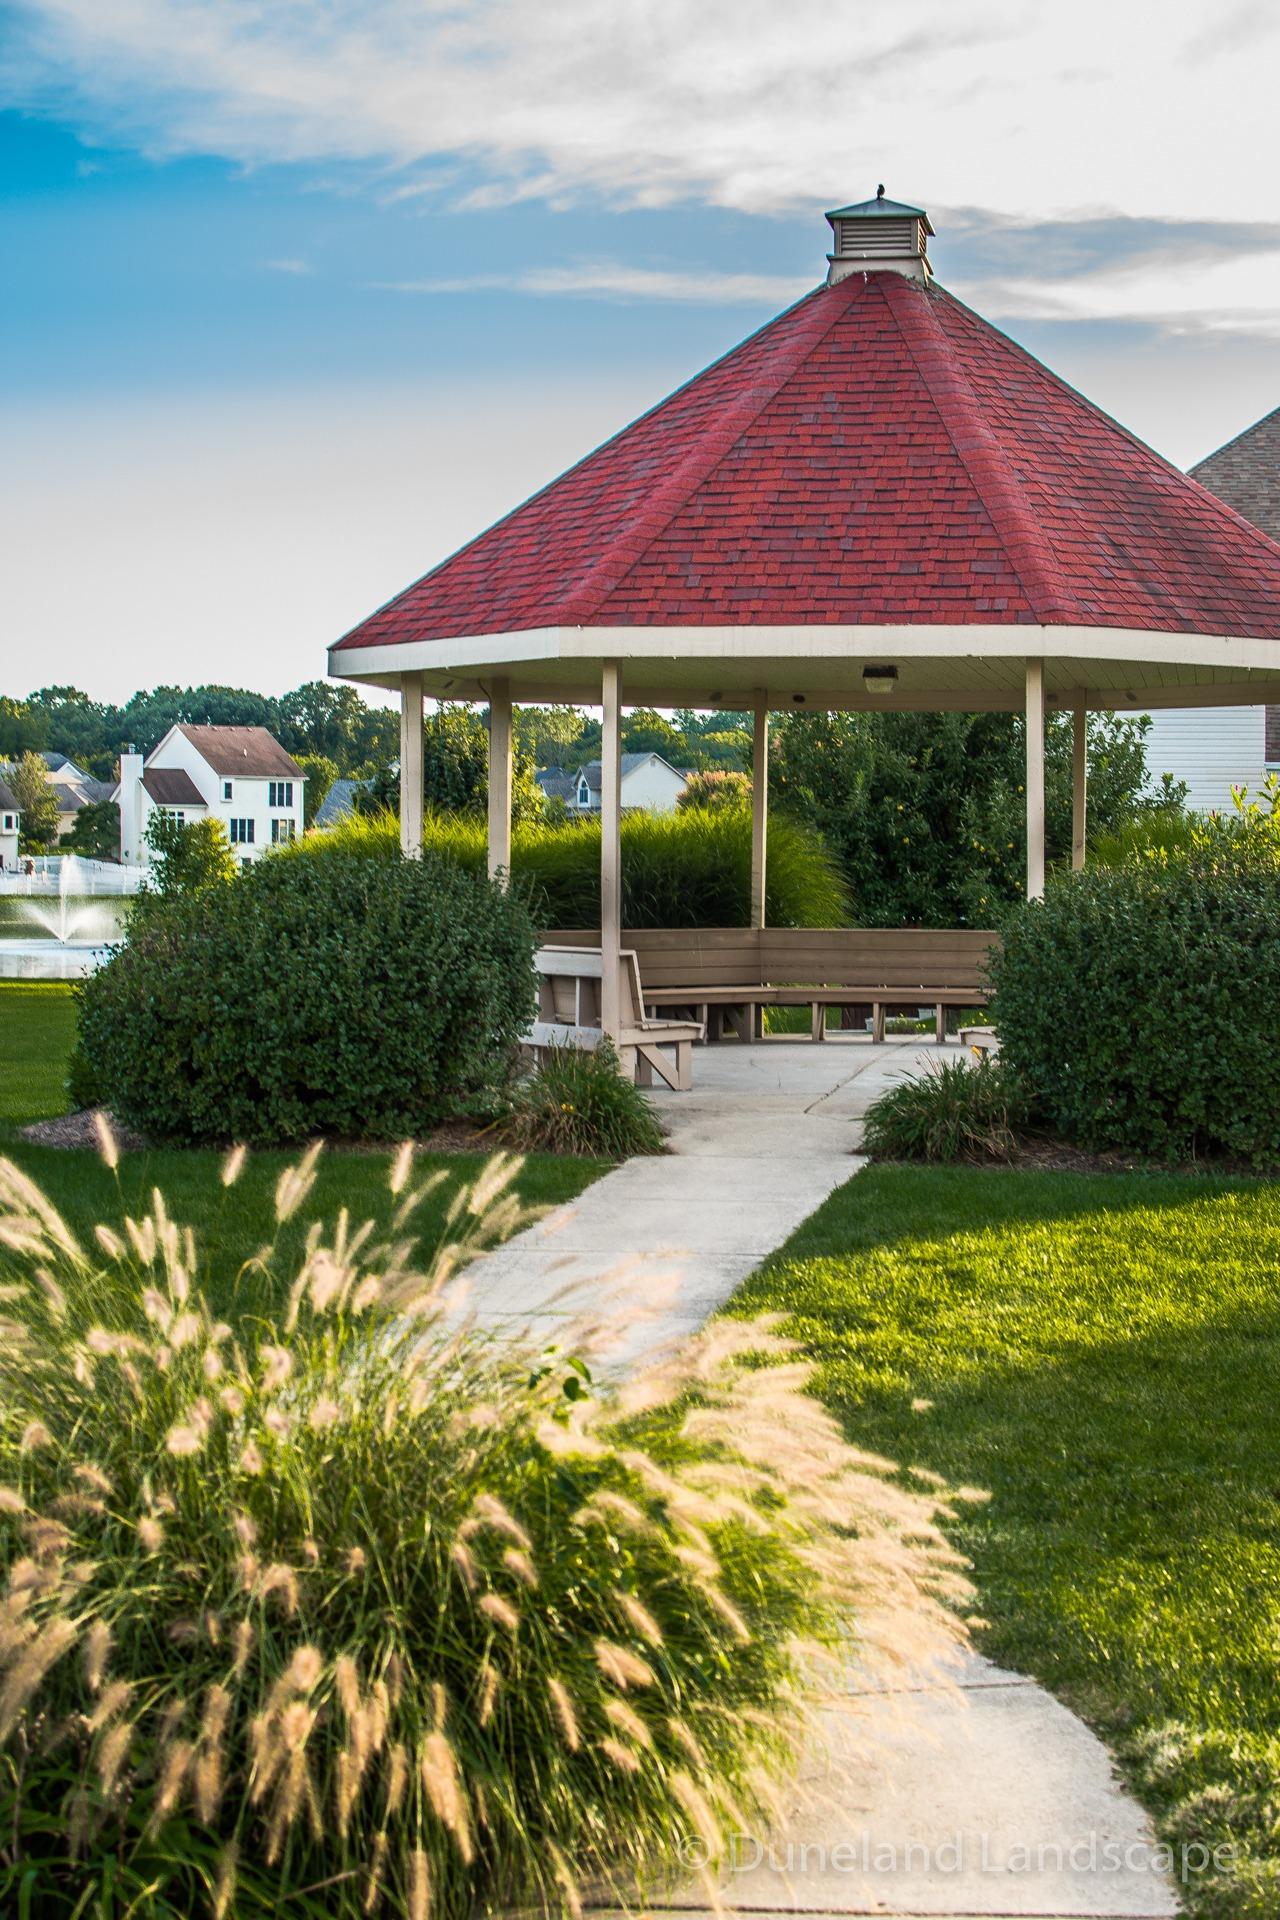 Landscaping design for local park